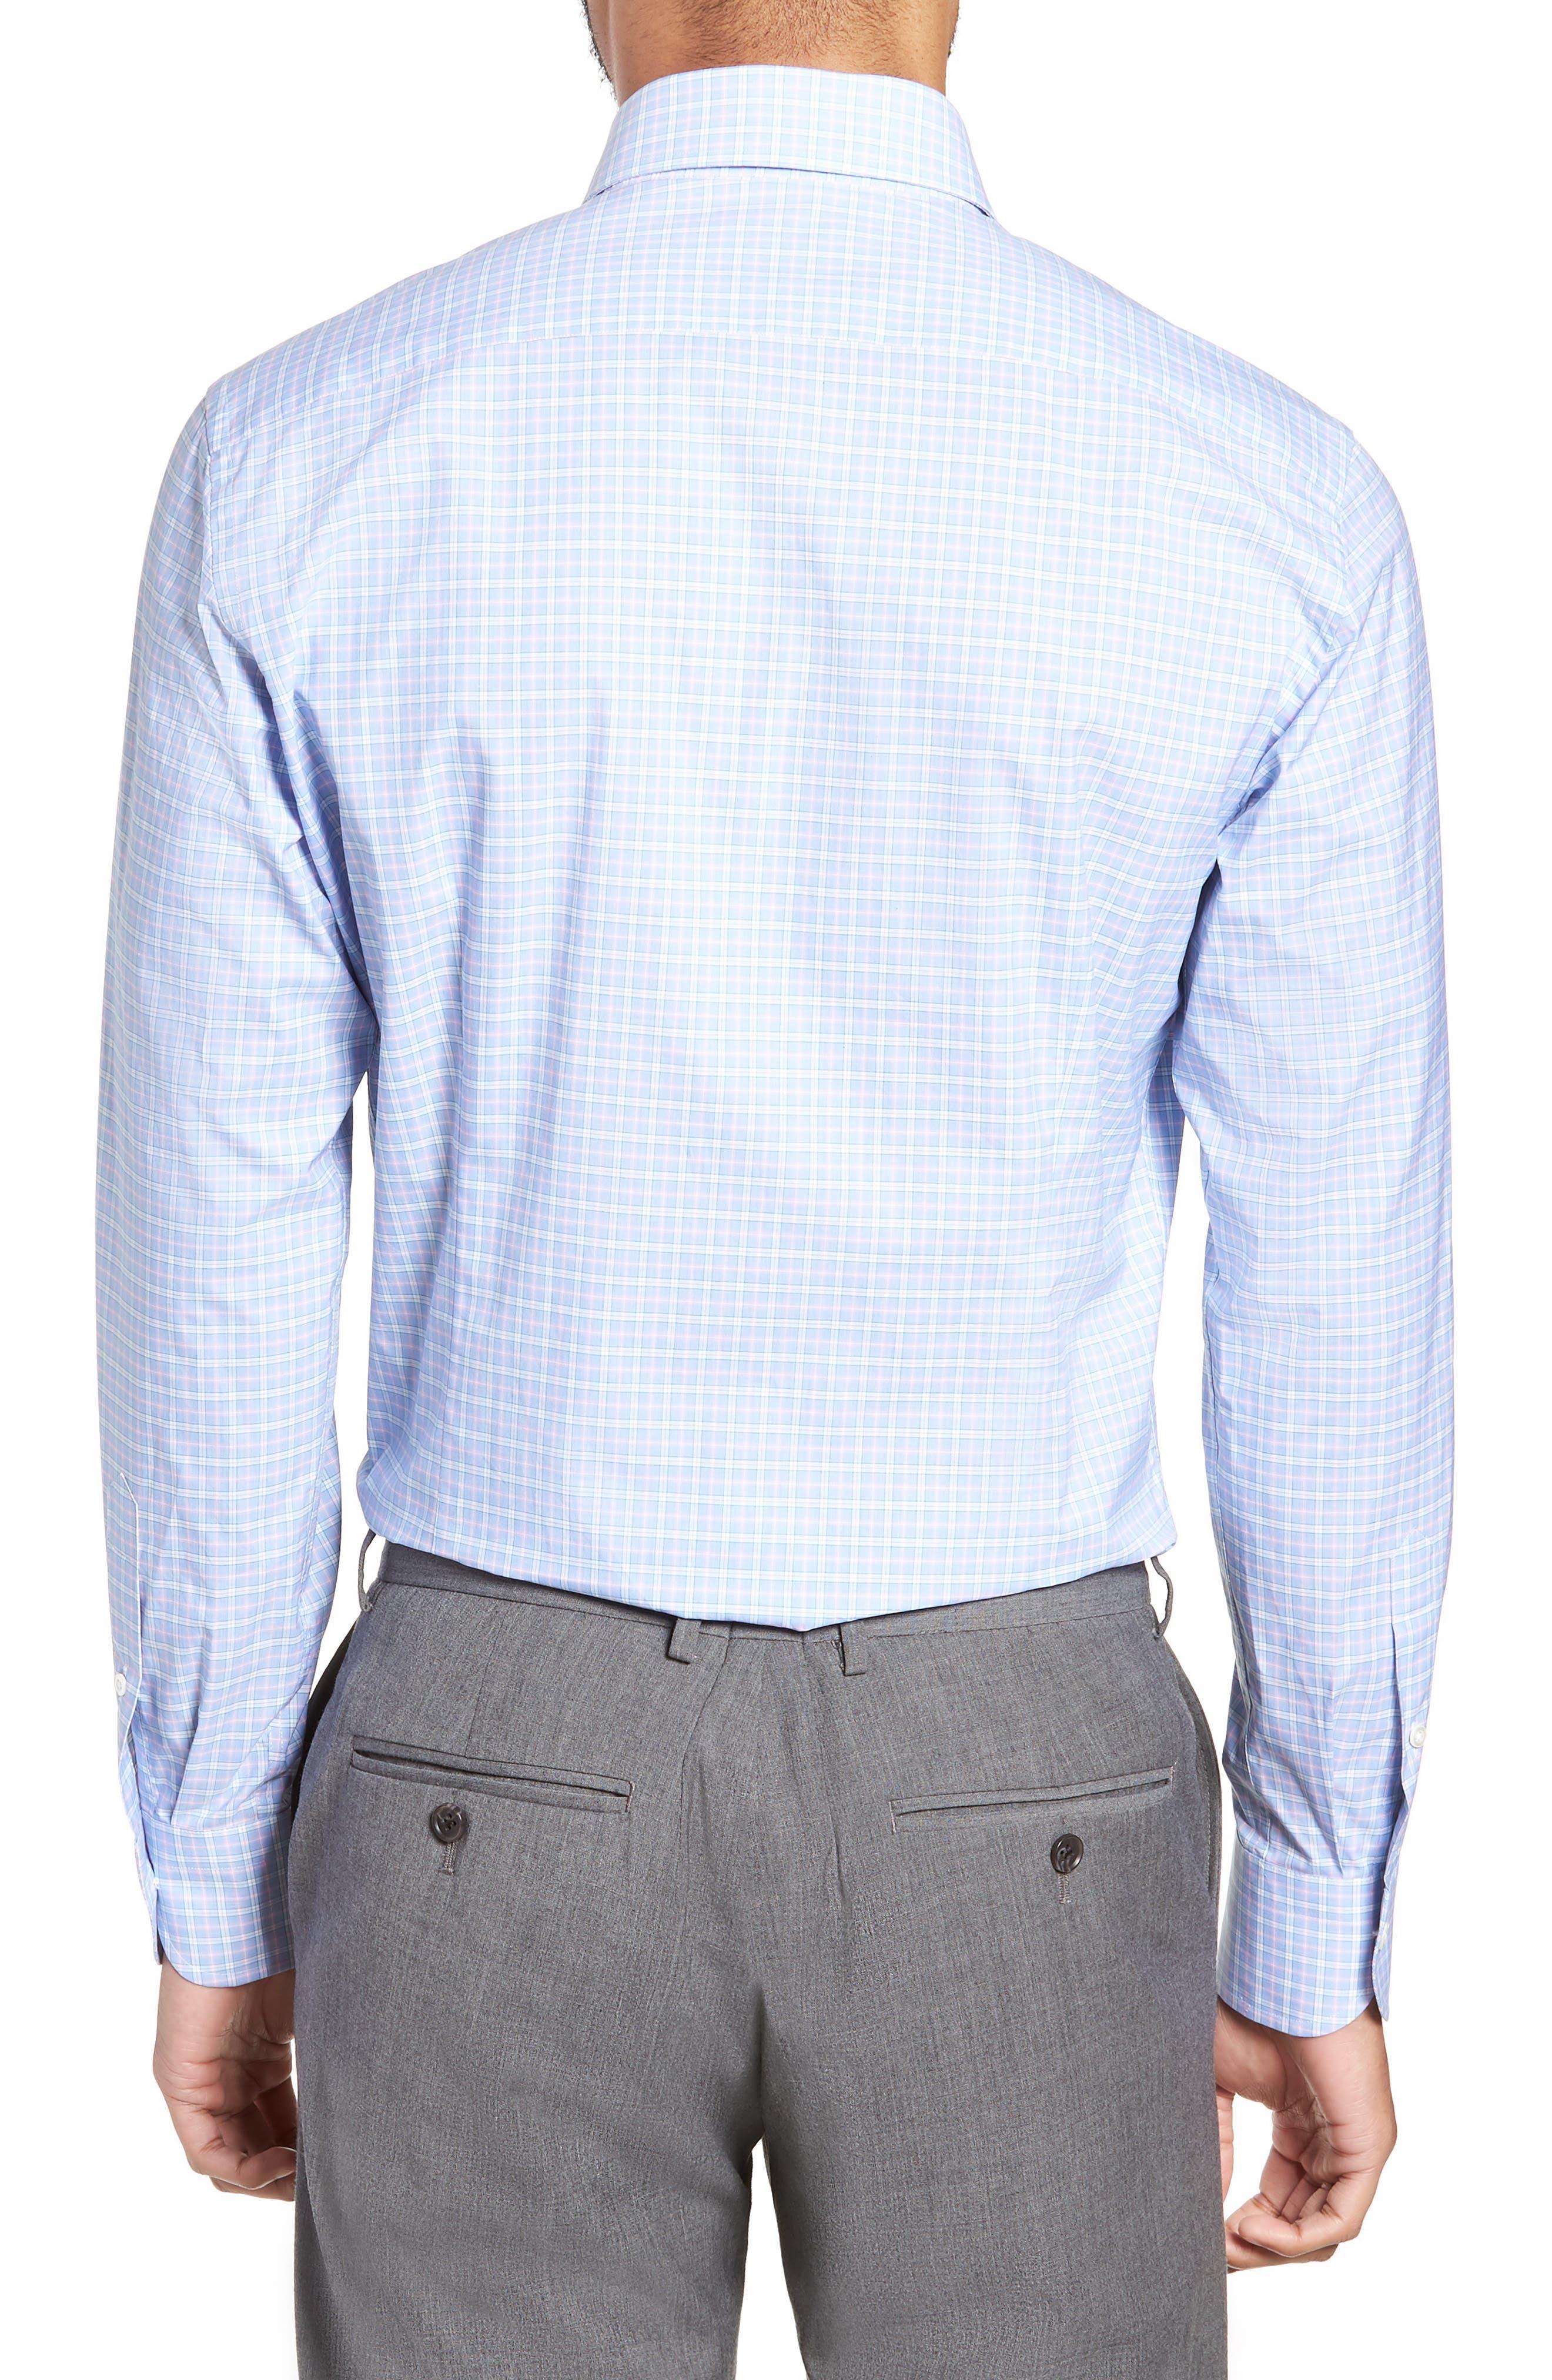 Ferris Slim Fit Check Dress Shirt,                             Alternate thumbnail 3, color,                             LIGHT/ PASTEL BLUE